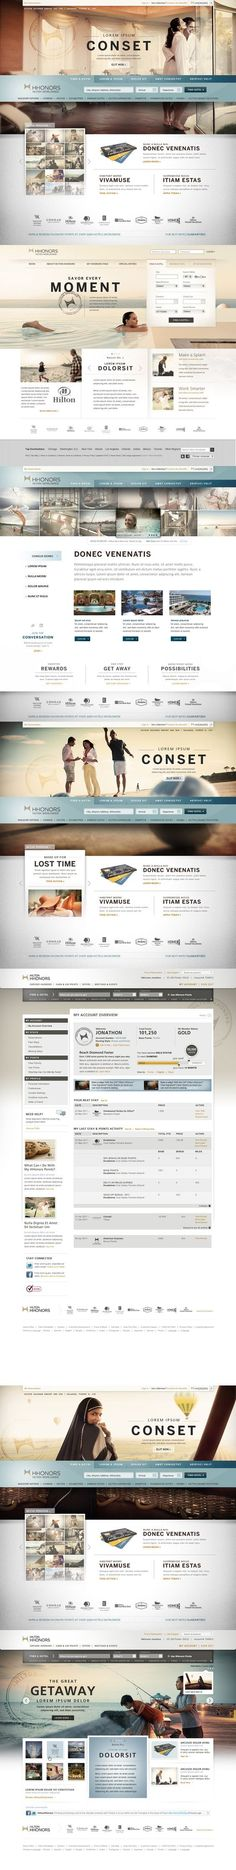 Hilton Web re-design...